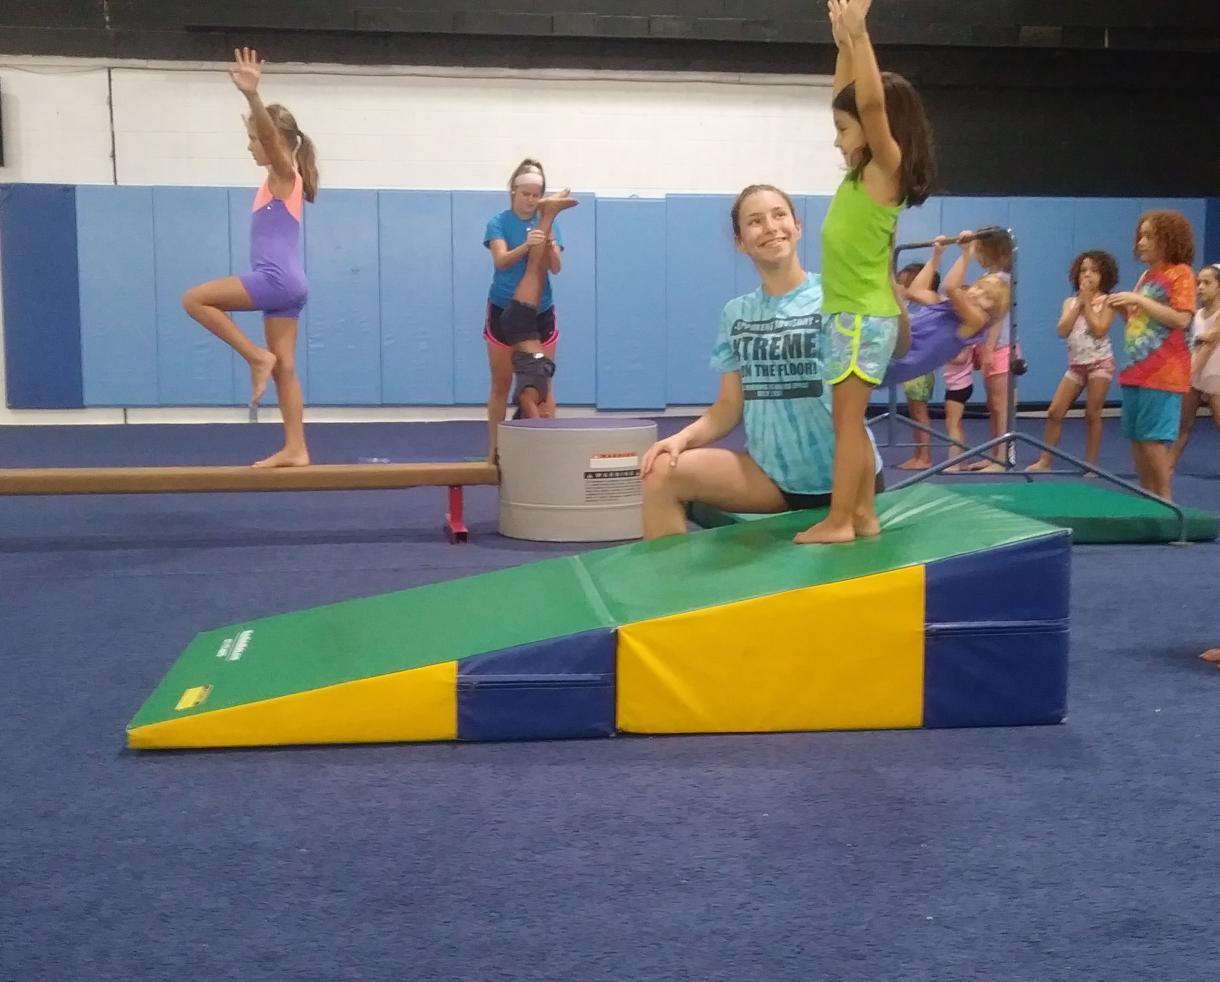 Xtreme Acro Acrobatics, Gymnastics, Tumbling, Trampoline & Parkour Classes